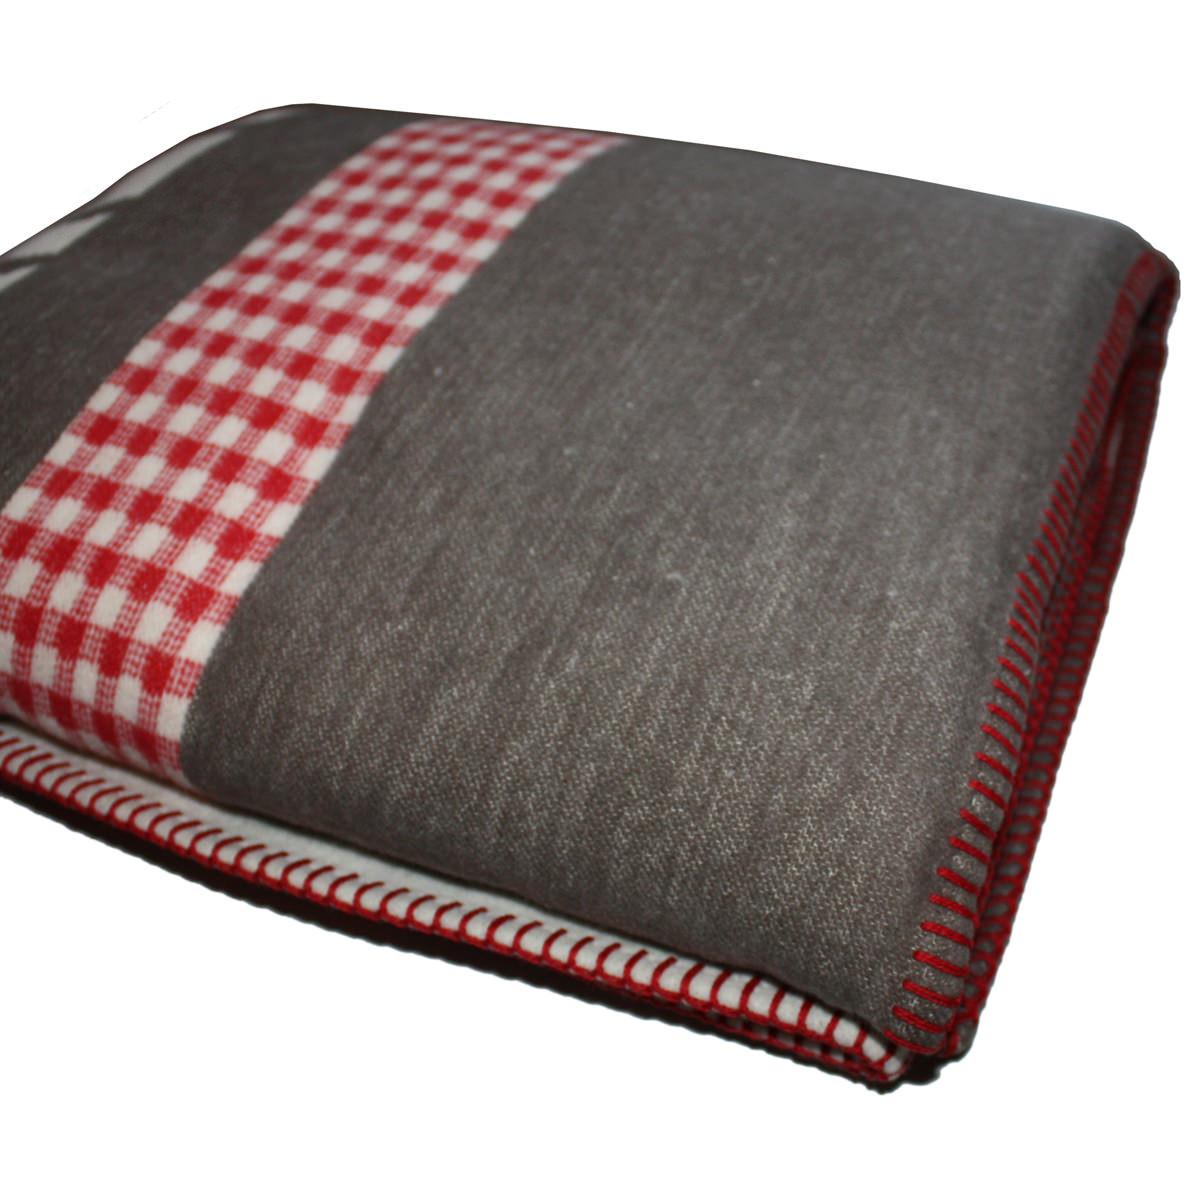 david fussenegger decke jade hirsch 200x150 cm. Black Bedroom Furniture Sets. Home Design Ideas